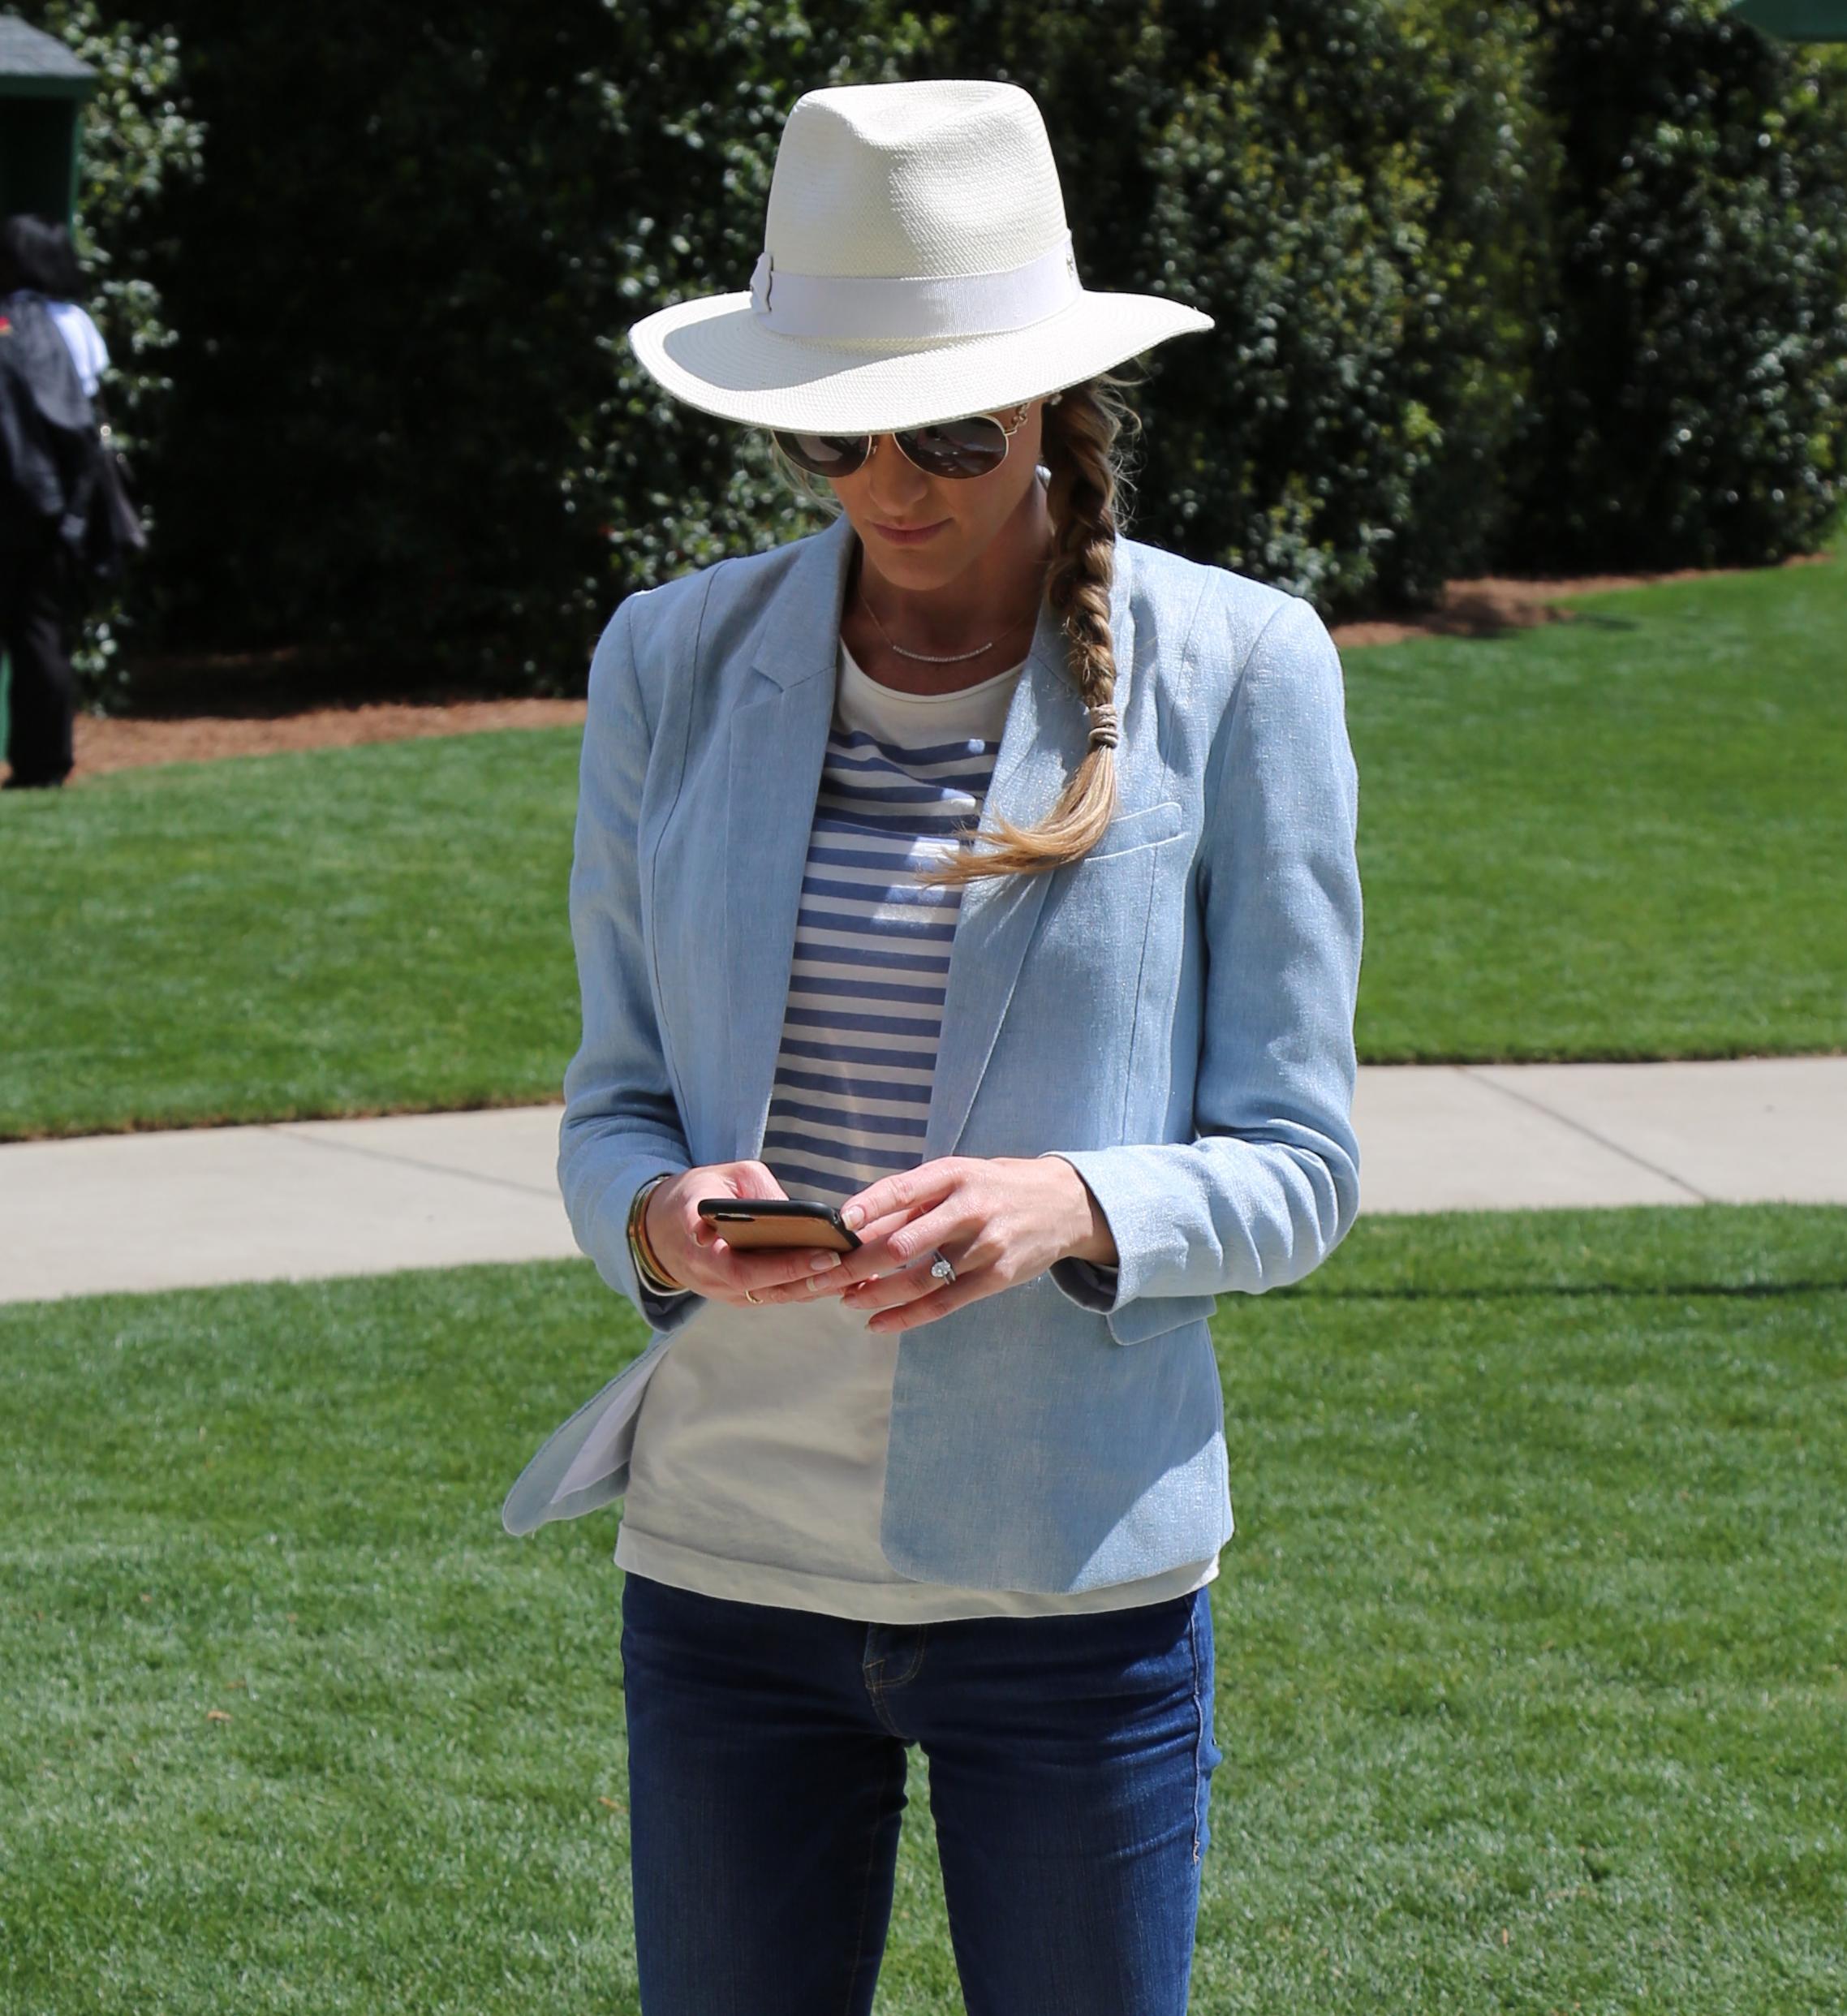 Jeans: Frame, Shirt:KitX, Blazer:Zara, Ring: G, Hat: Helen Kaminski, Sunnies: Gucci